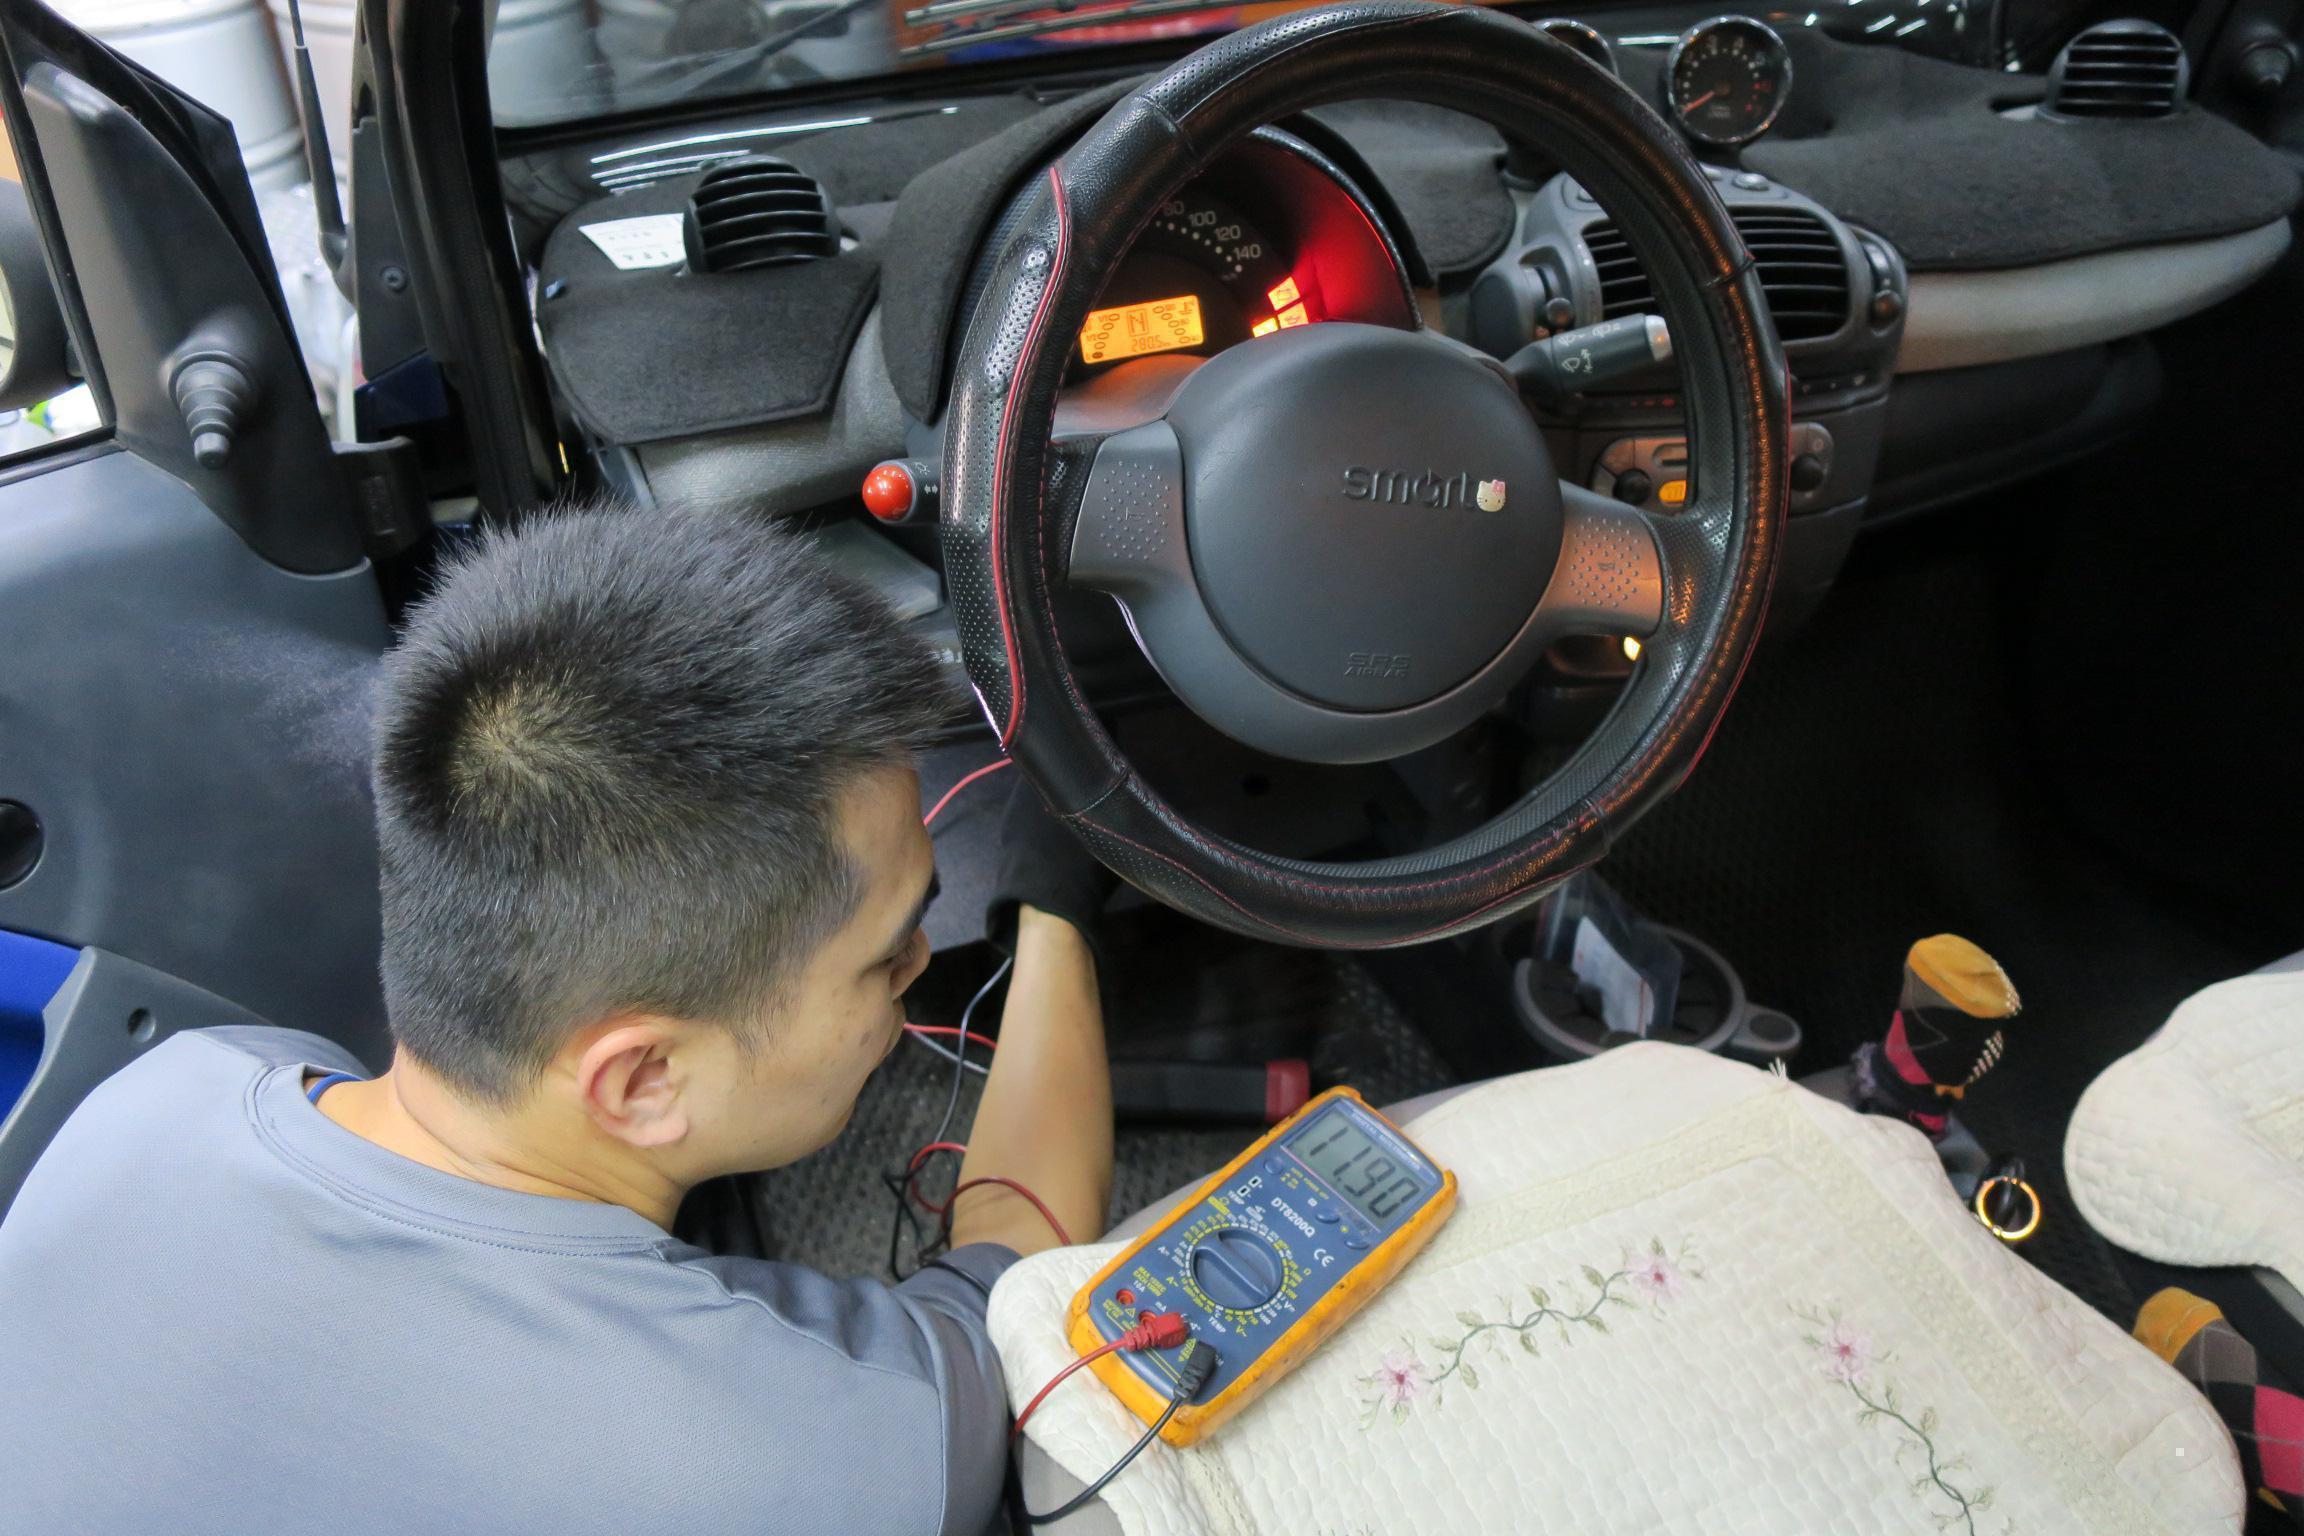 OiCar駿晟汽車維修中心/M-Benz&Smart專修